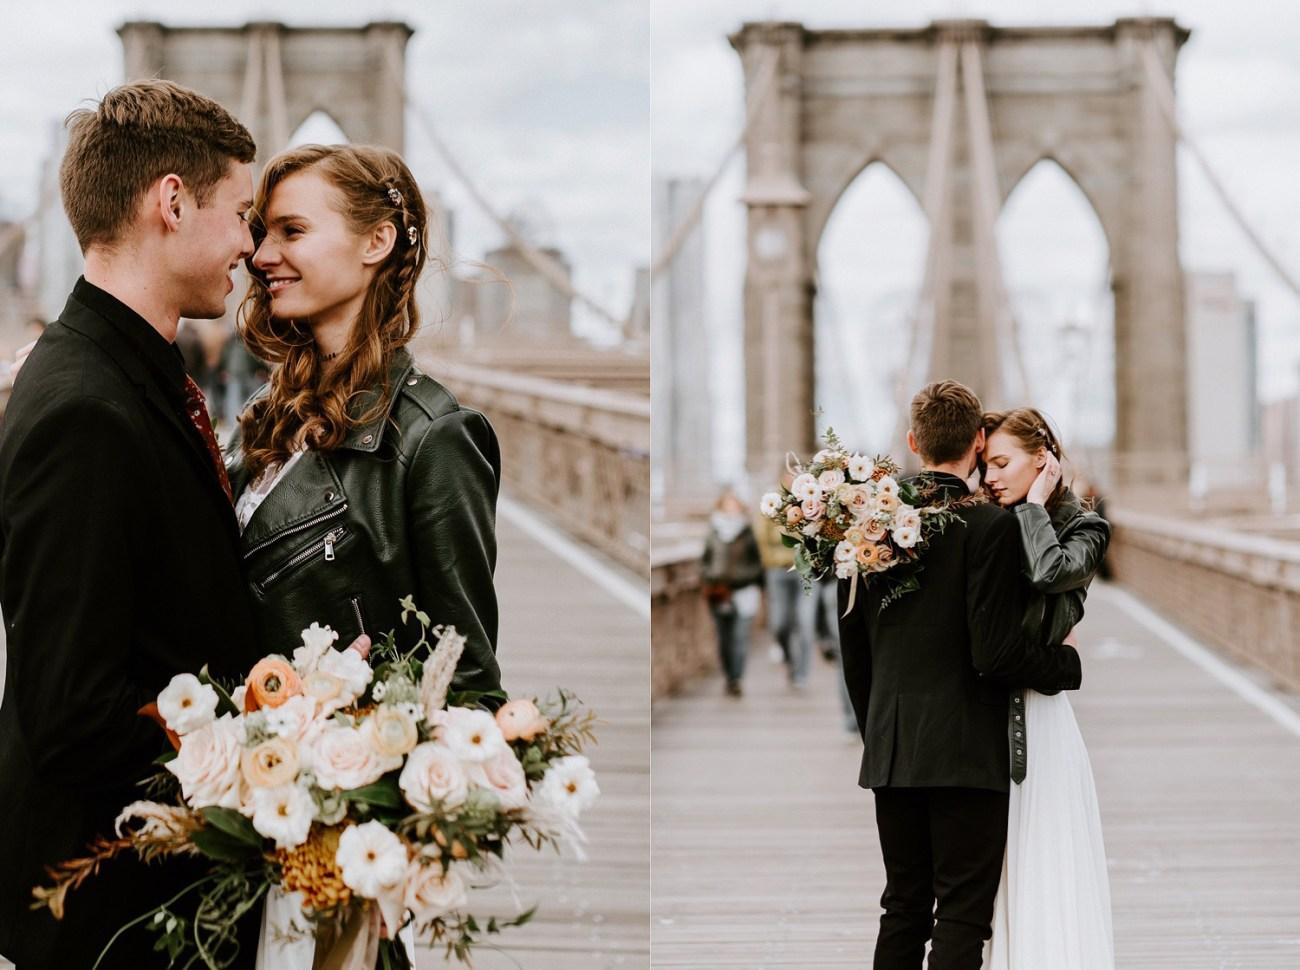 Bride and Groom on the Brooklyn Bridge for their bridal portrait. Brooklyn wedding photos. Dumbo Brooklyn Bride and Groom elopement photos. Anais Possamai Photography. New York Wedding Photographer